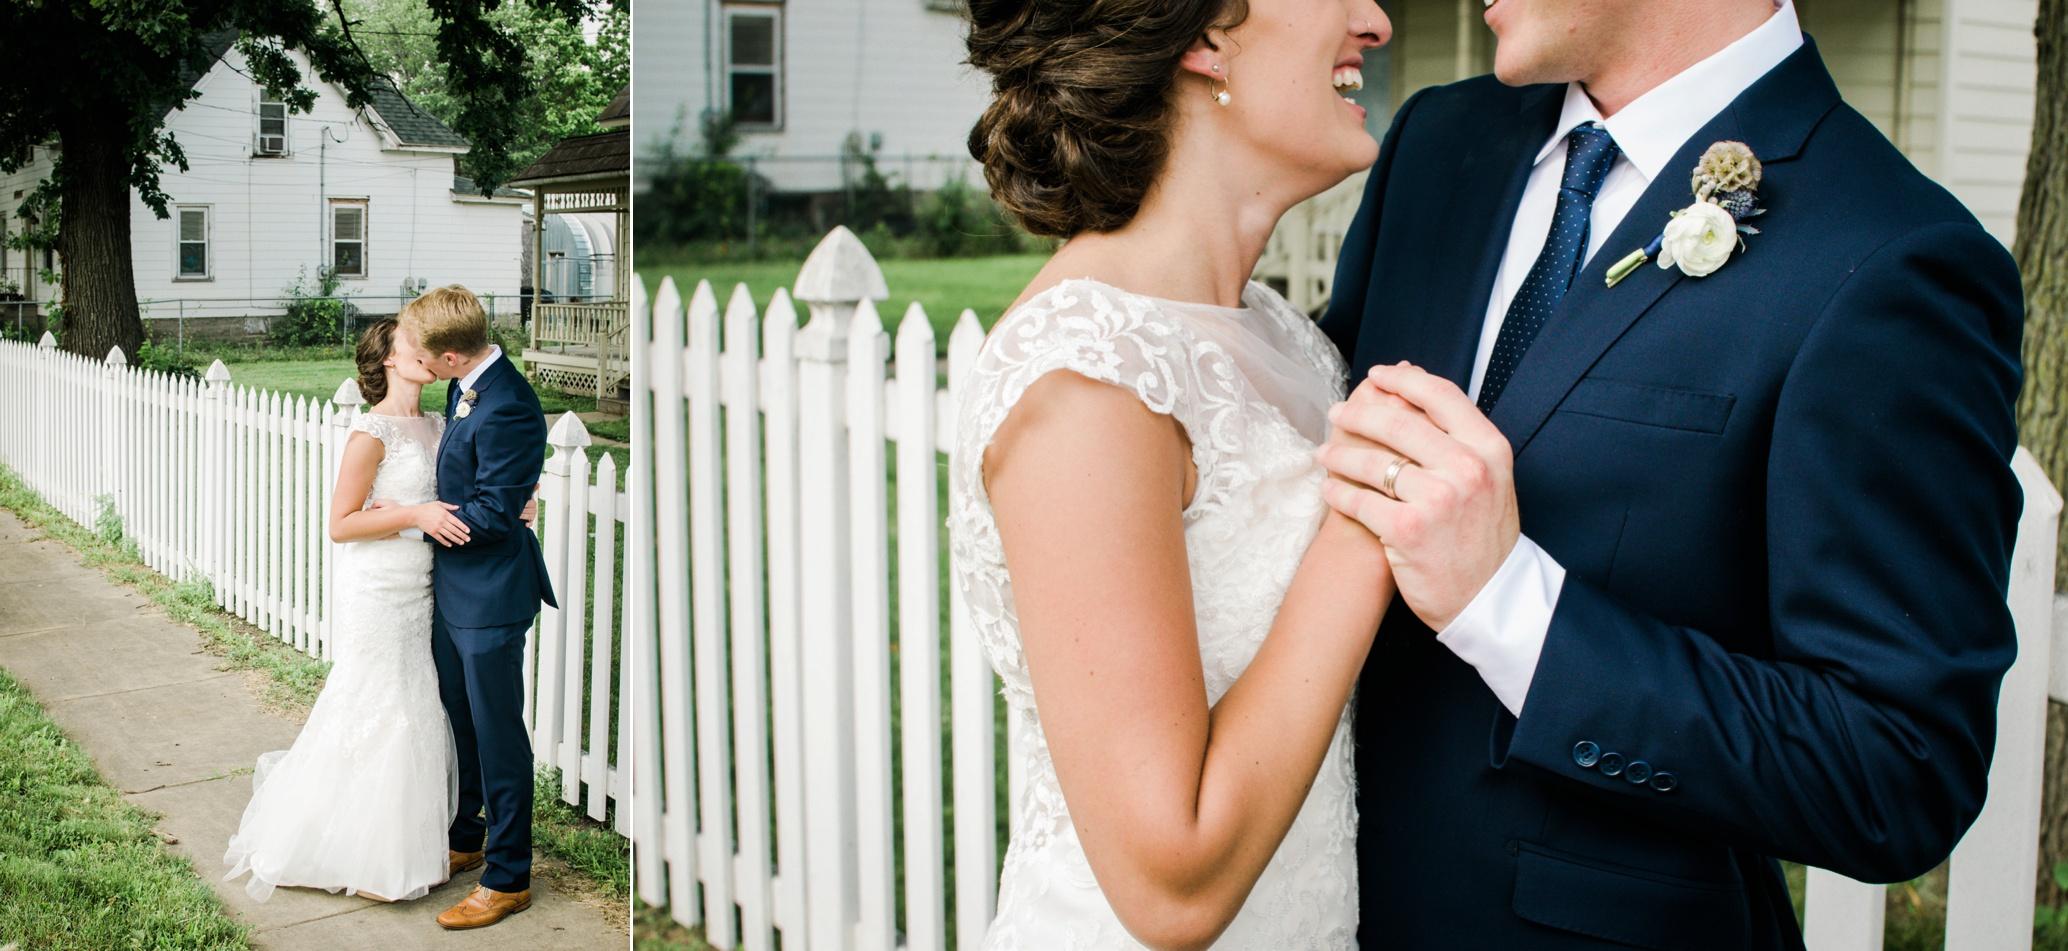 Palmer House and Stable Solon, IA | Ali Leigh Photo Minneapolis Wedding Photographer_0282.jpg